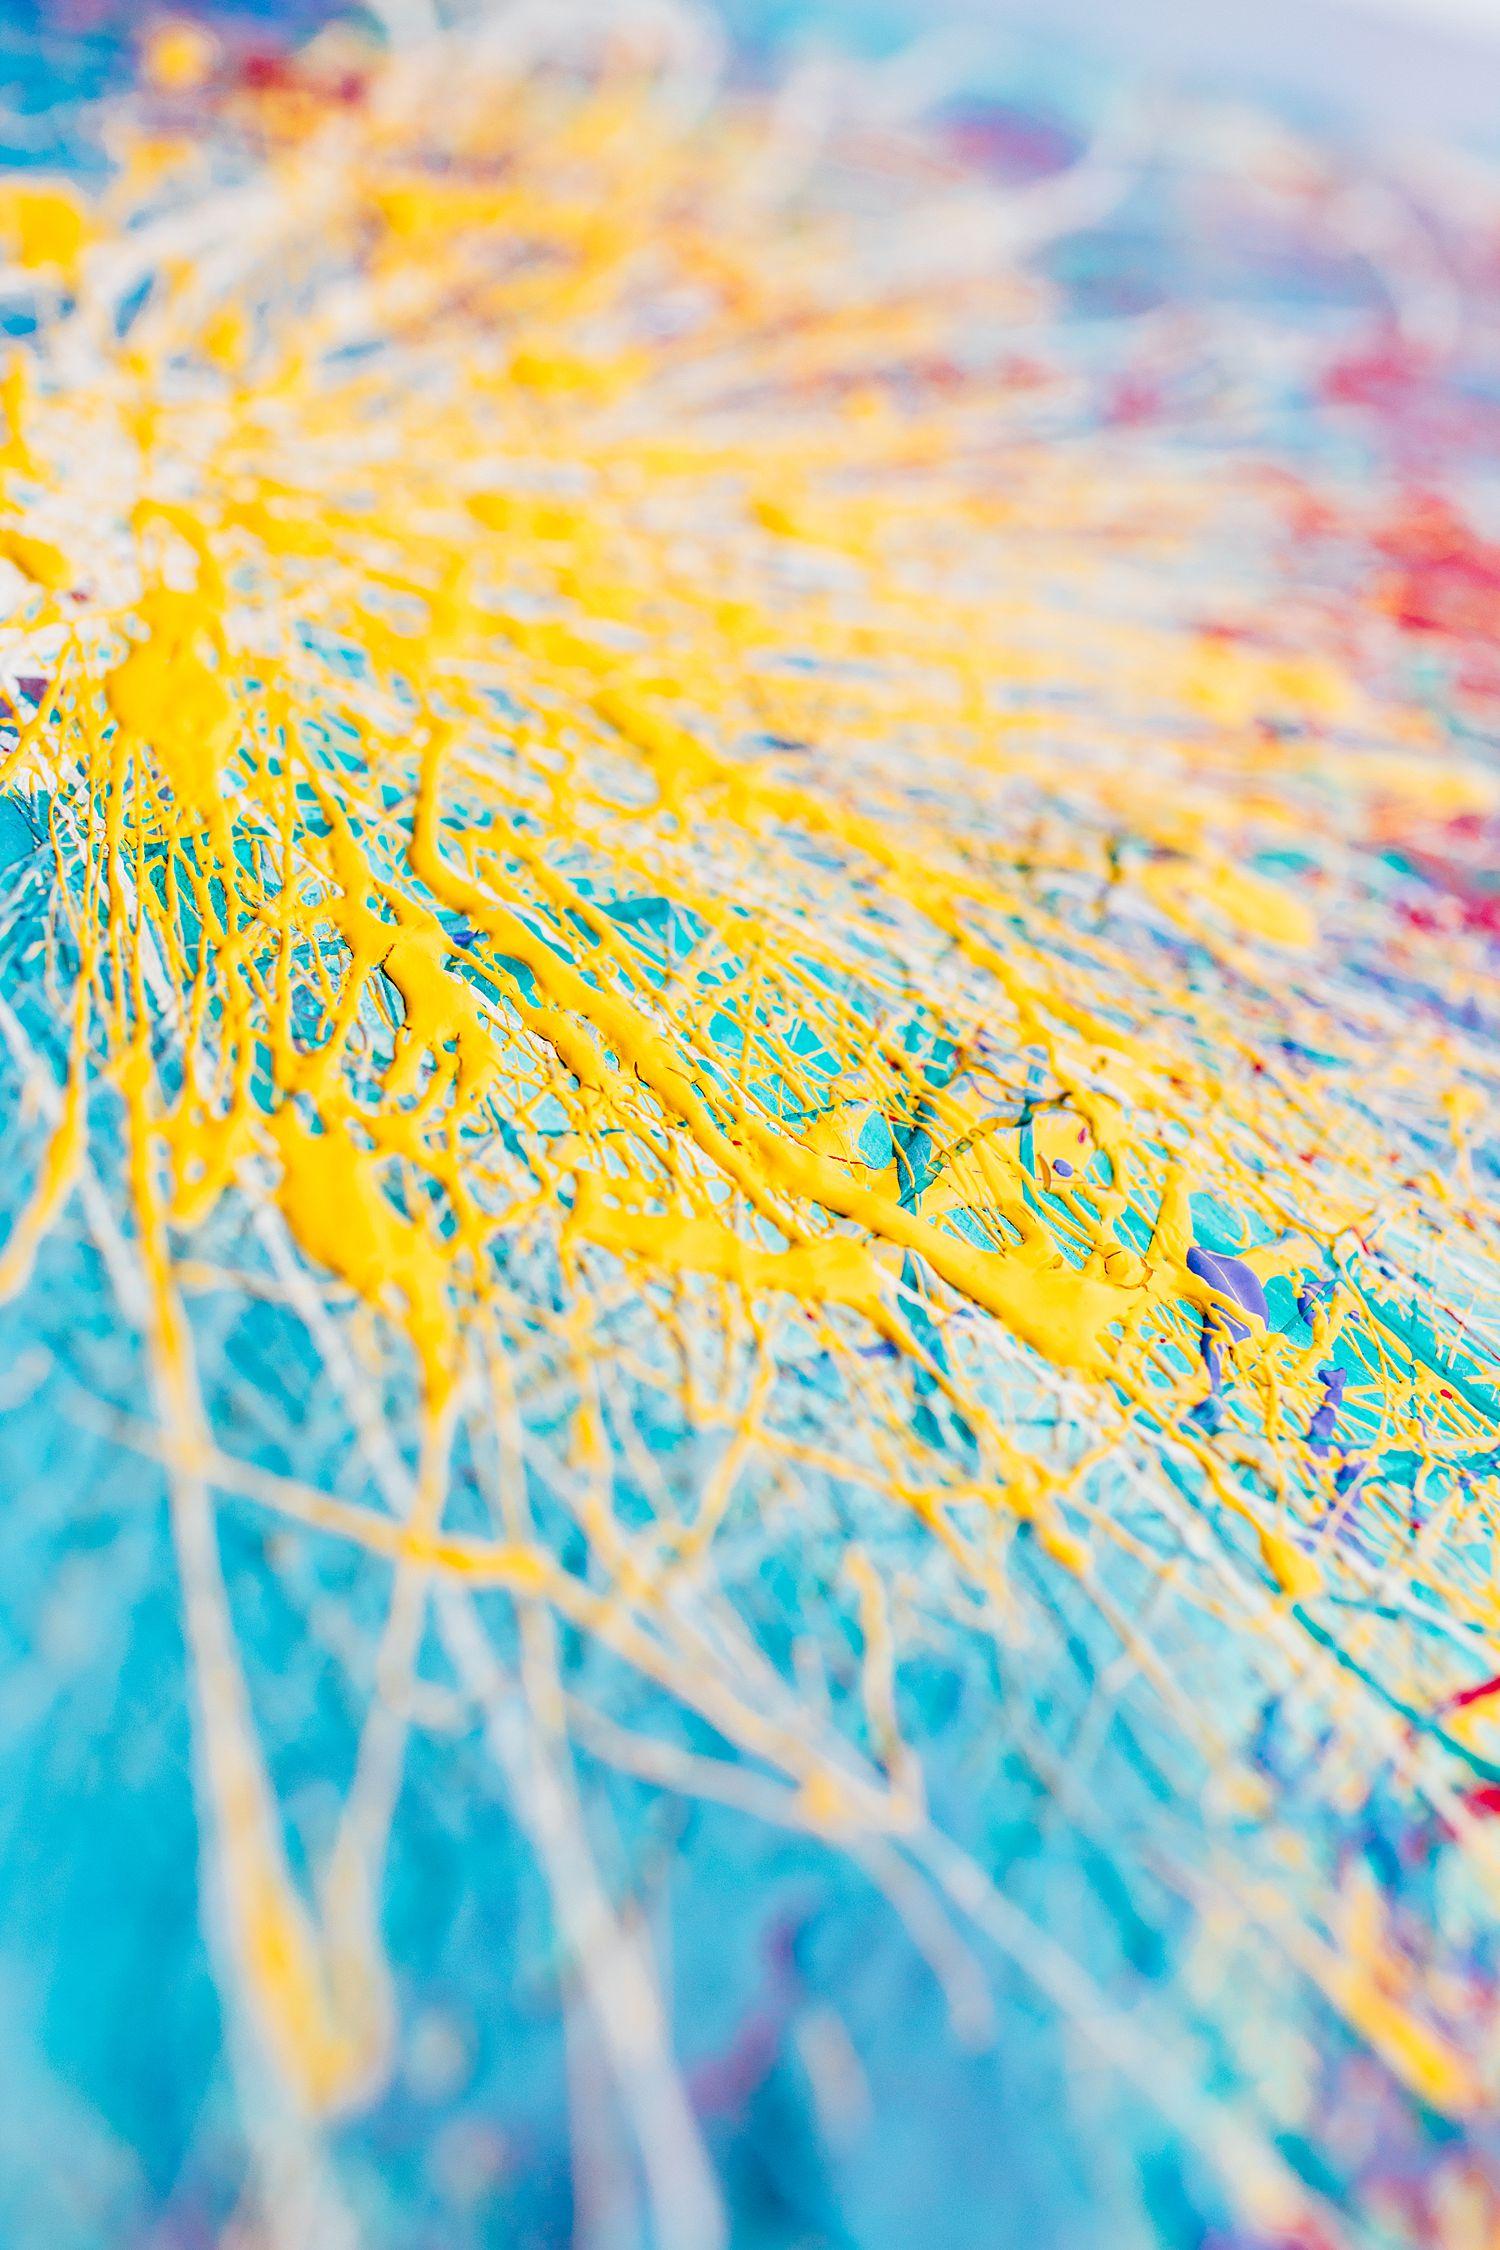 Cha Wilde Paintings - February 2019 - Life, I'm Afraid of Her-5_WEB.jpg